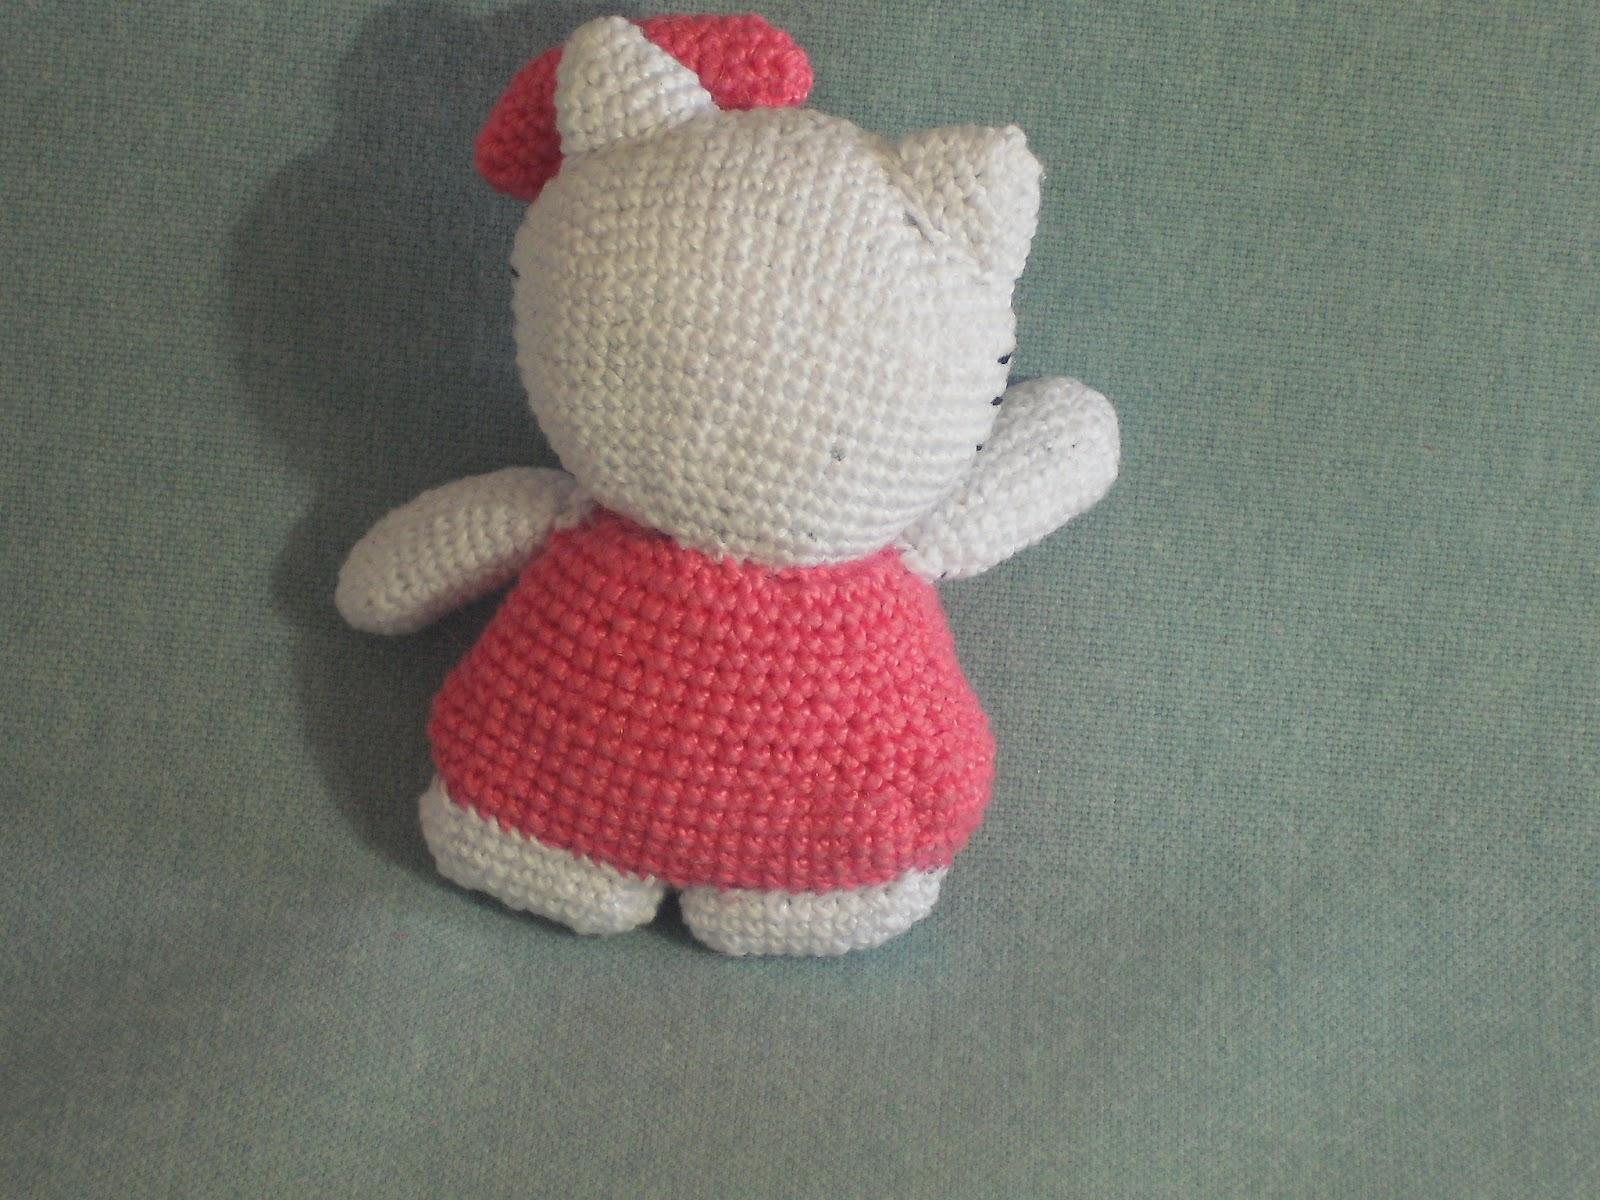 Amigurumi Kitty Espanol : Amigurumis en espanol: Mi Hello Kitty amigurumi.